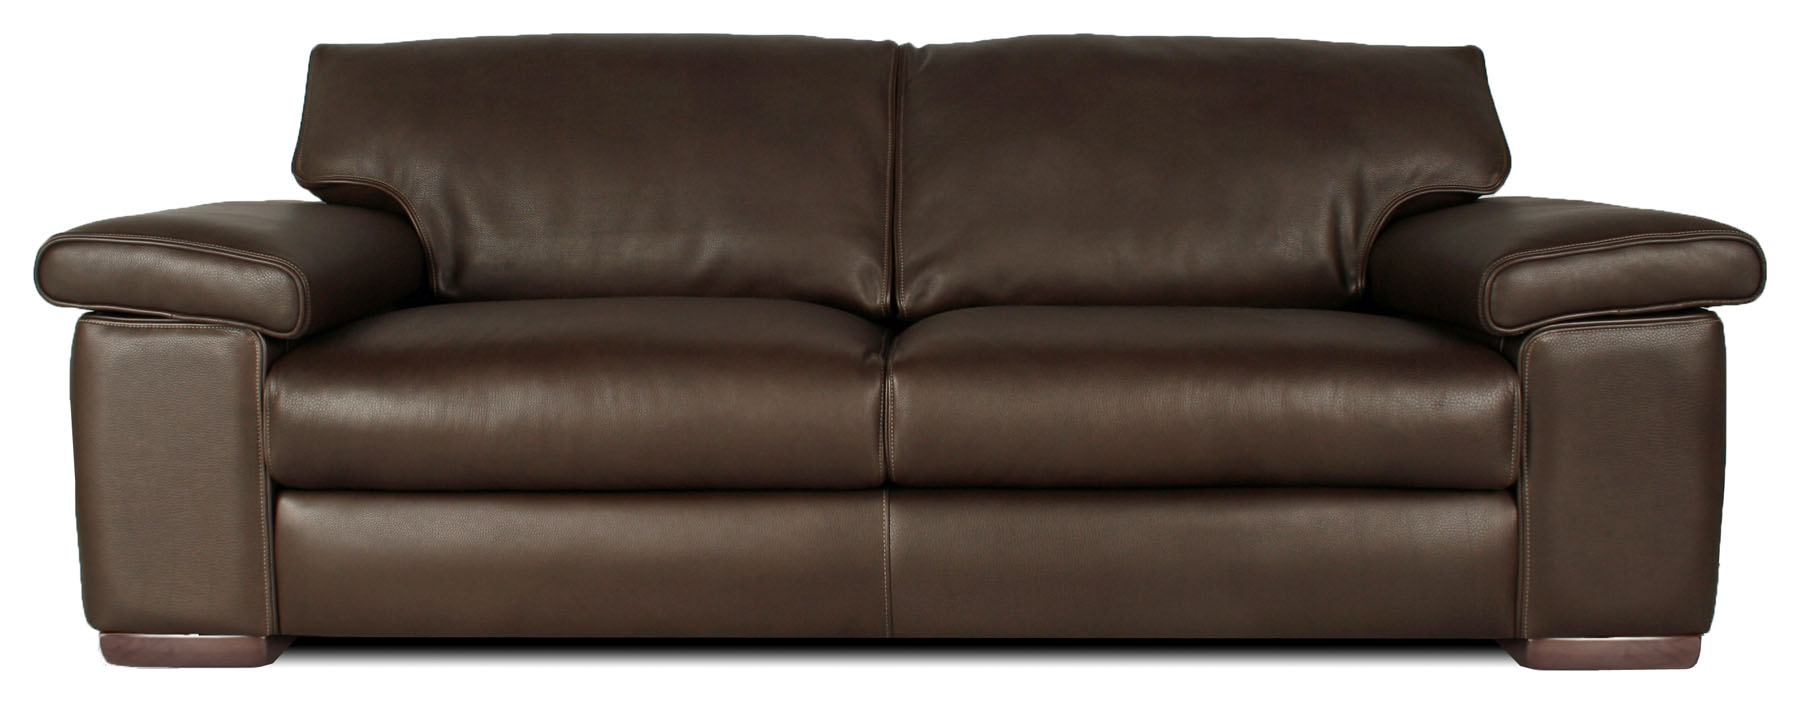 Loading zoom Couture Custom Leather Sofa